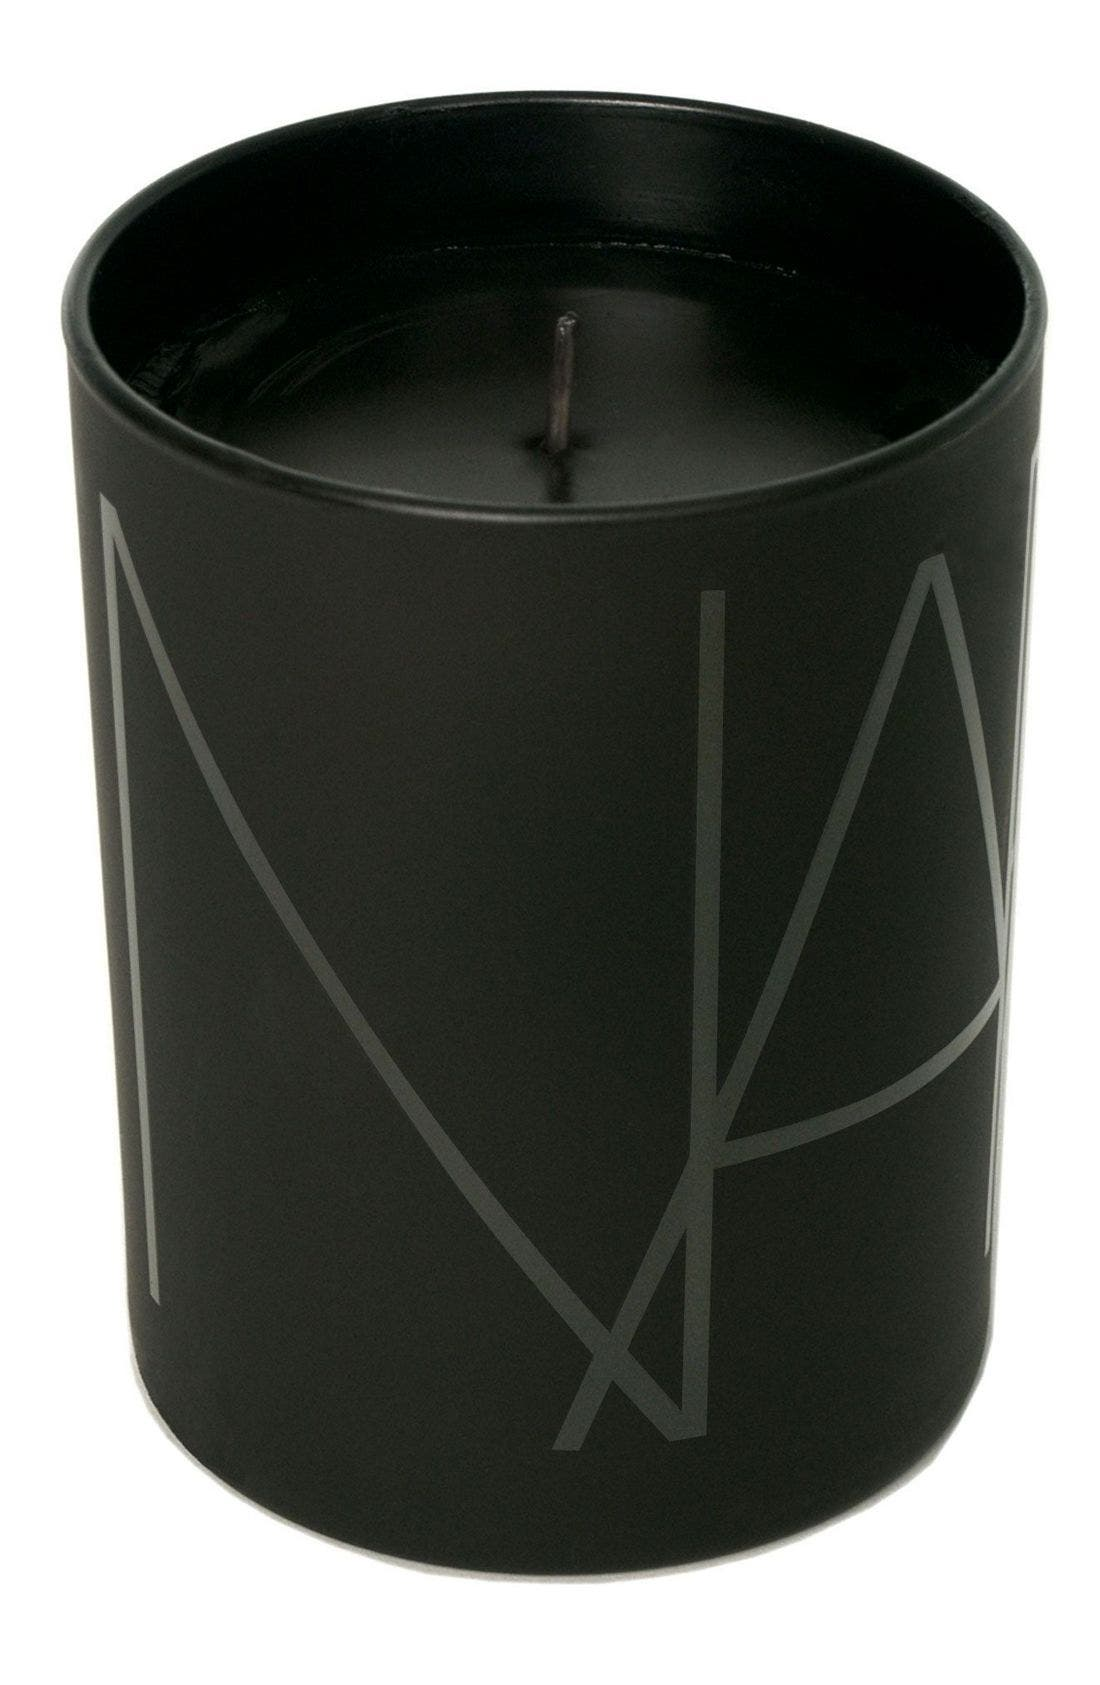 NARS Acapulco Candle